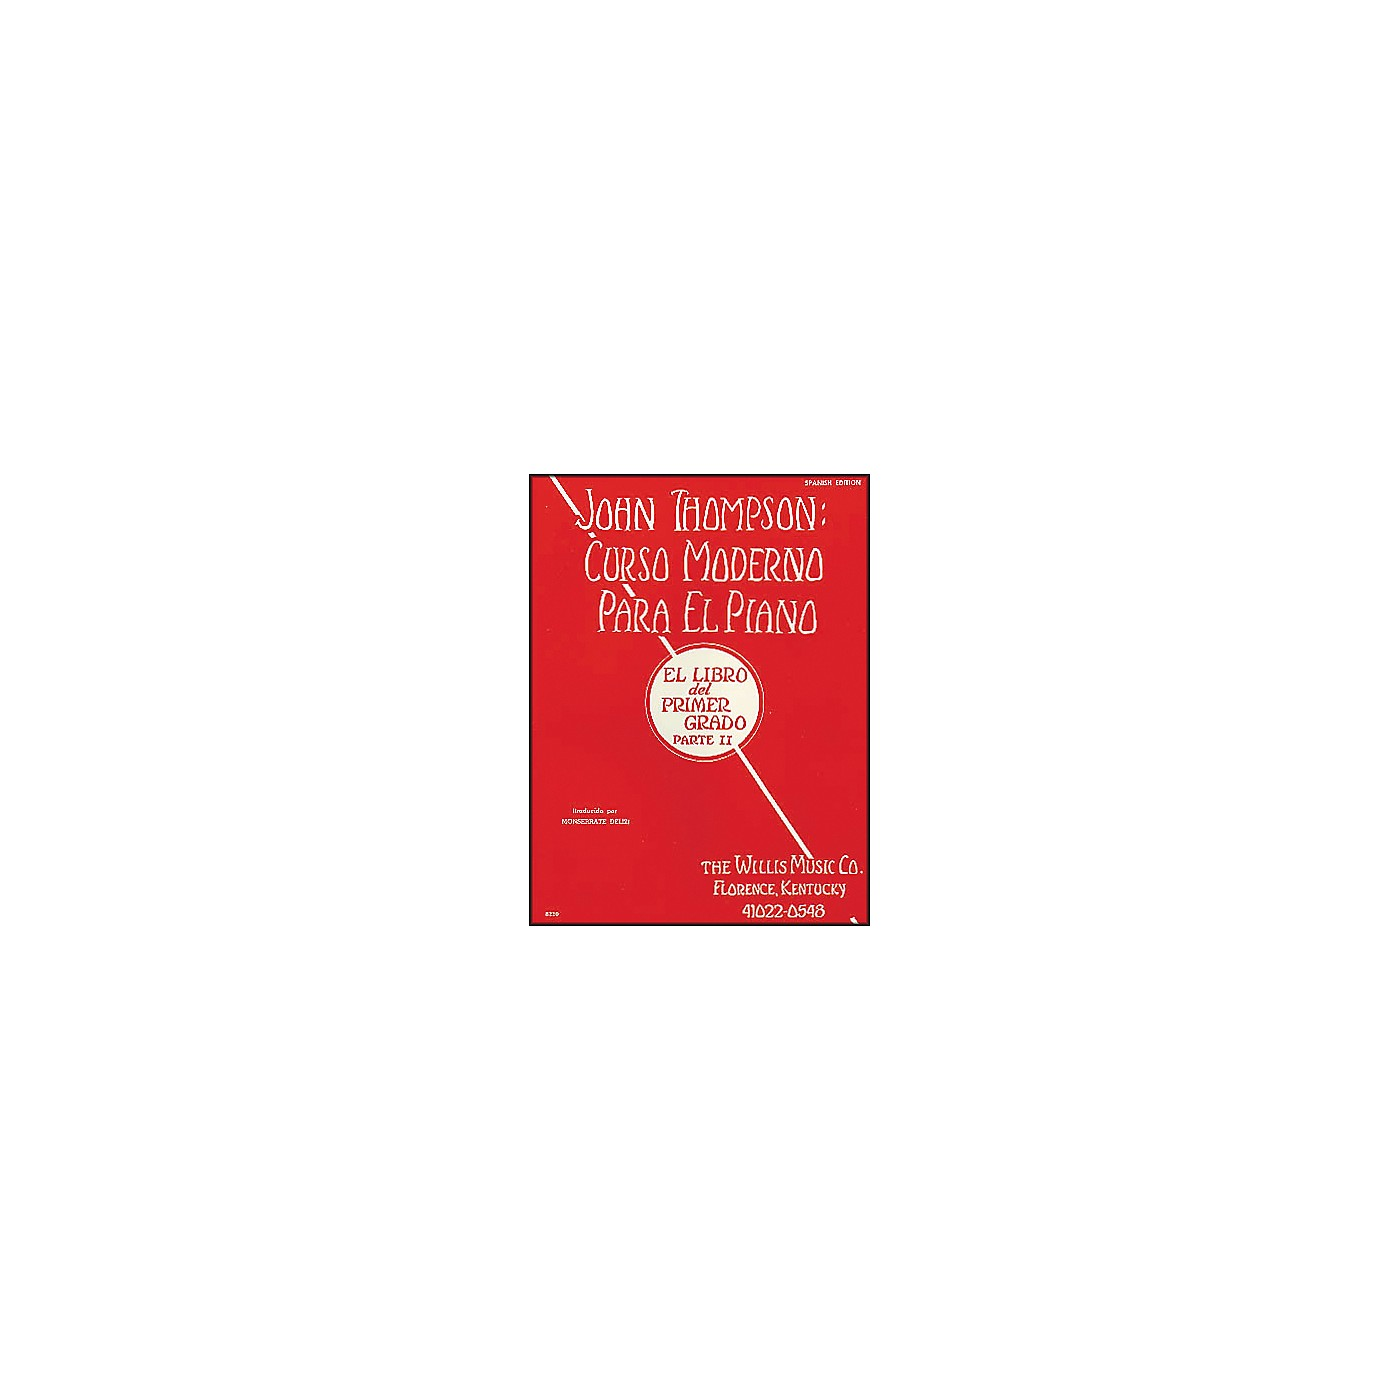 Willis Music John Thompson's Modern Course for Piano Book 2 (Spanish Edition) Curso Moderno thumbnail